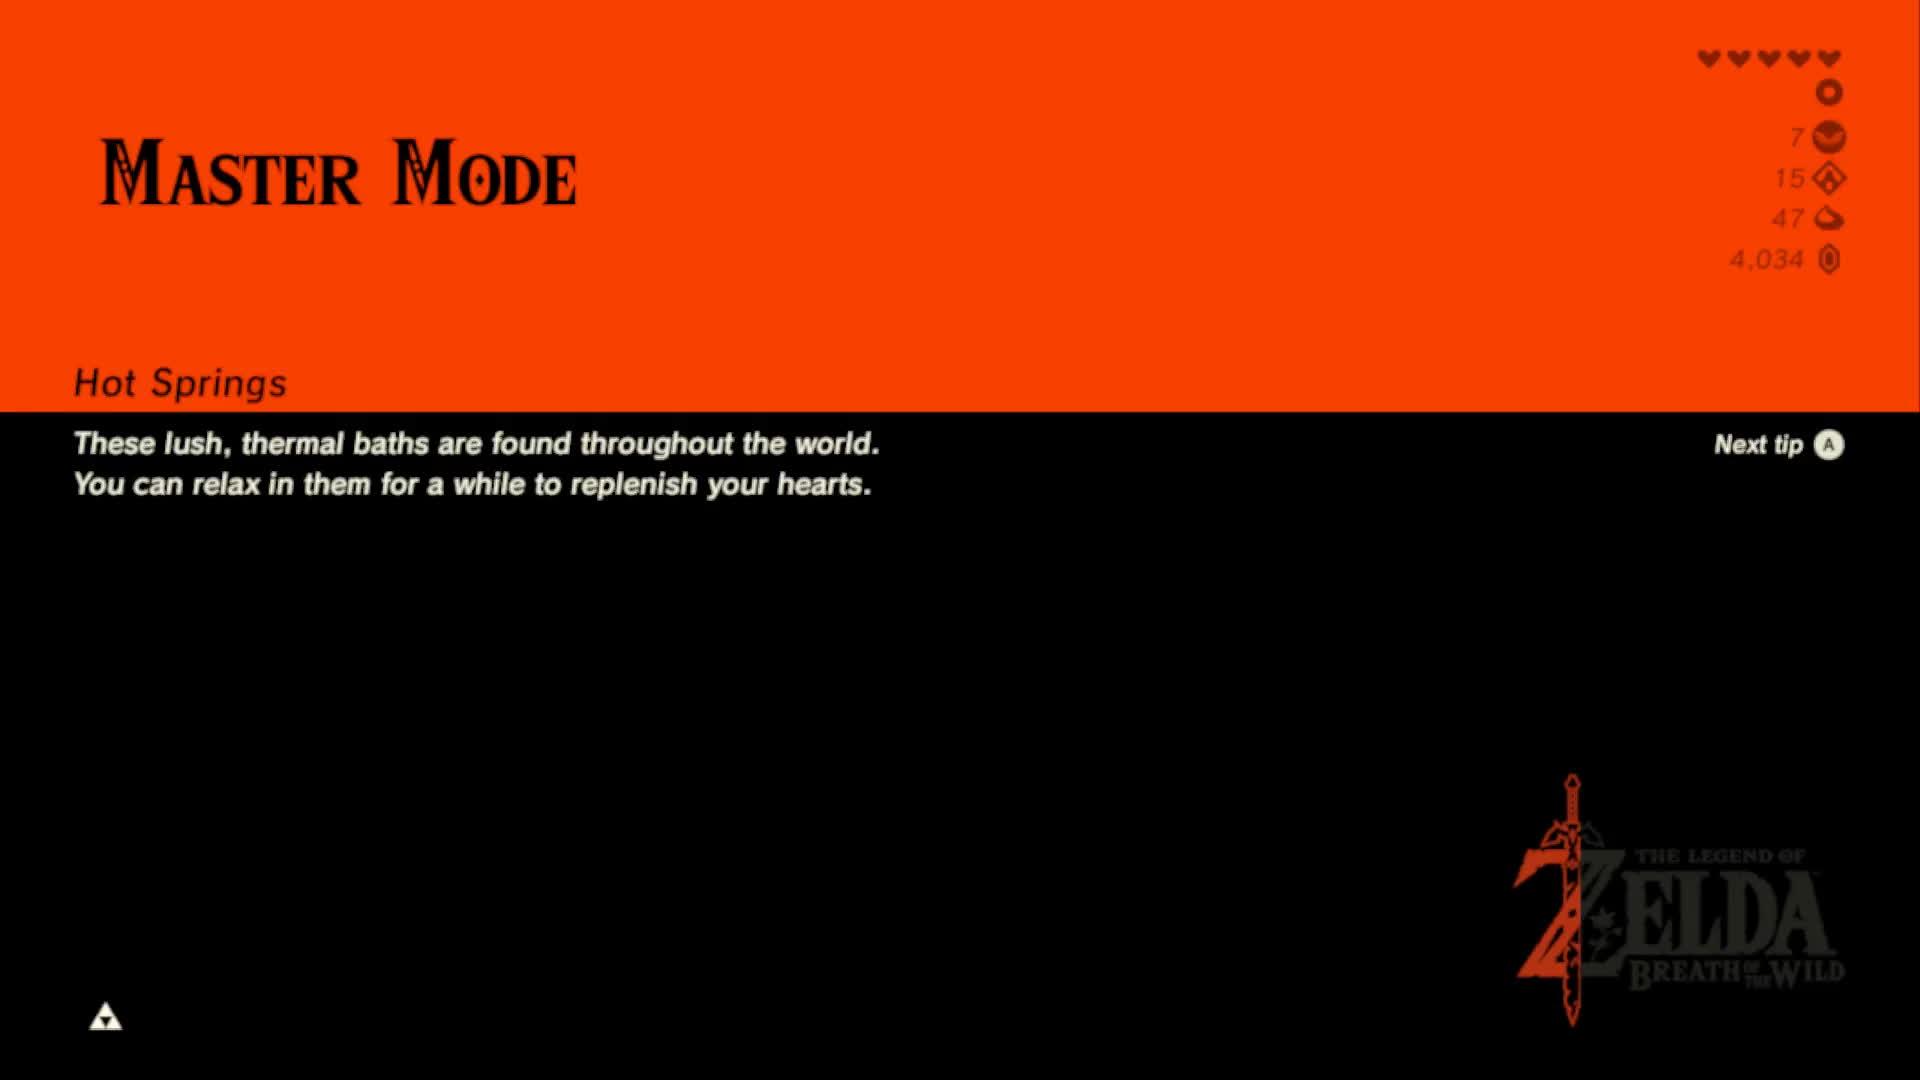 Cemu Zelda Gifs Search | Search & Share on Homdor